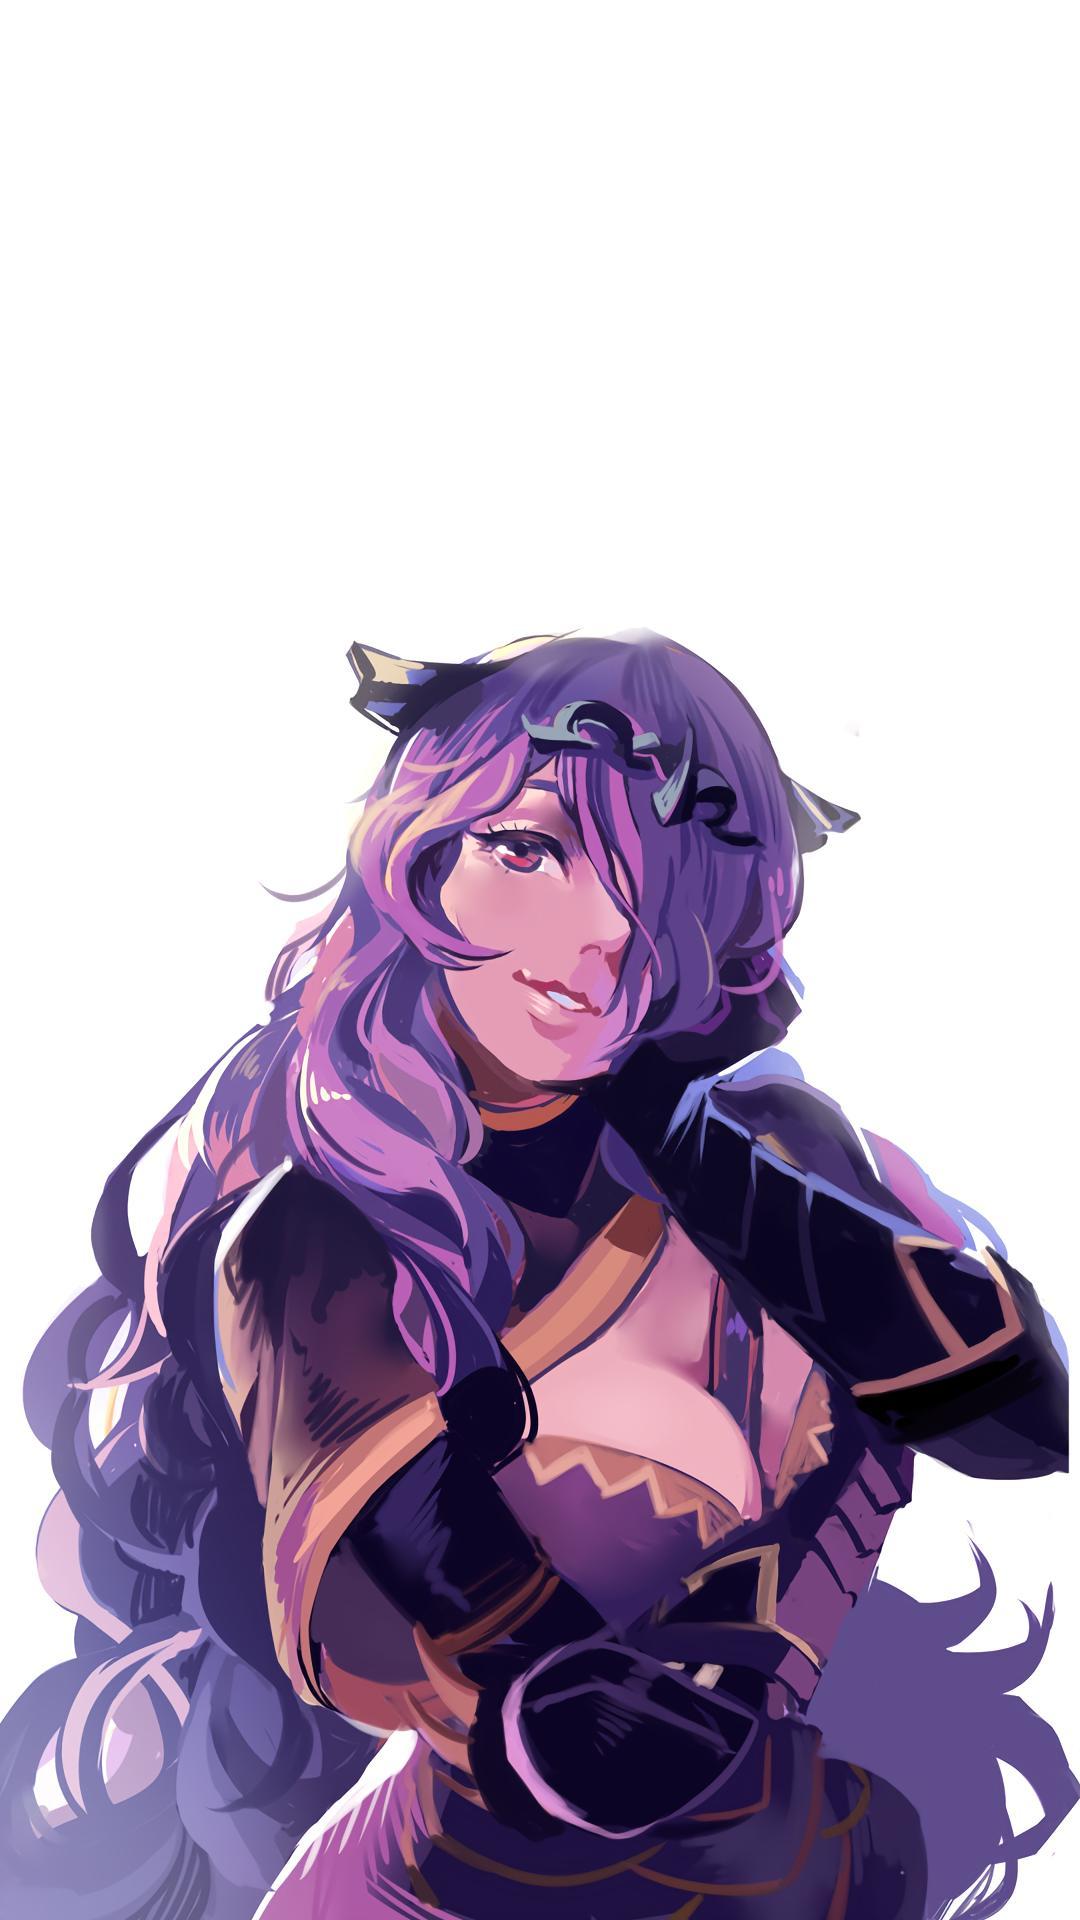 Camilla Fire Emblem Fates Mobile [1080×1920] Imgur - Camilla Art Fire Emblem , HD Wallpaper & Backgrounds